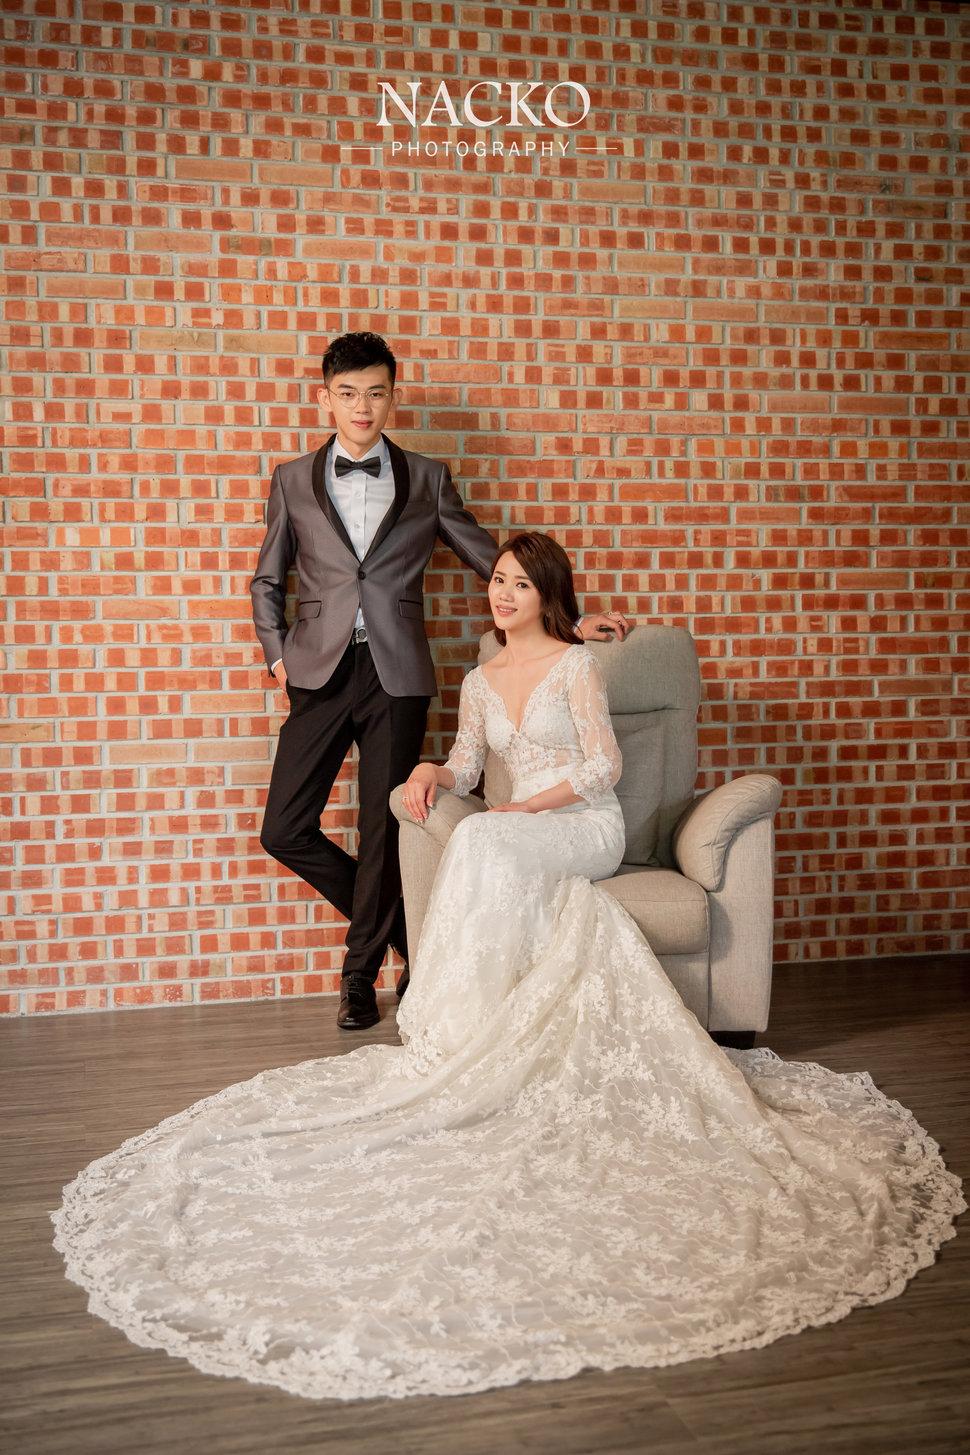 CHIN6143SS - Nacko photography《結婚吧》